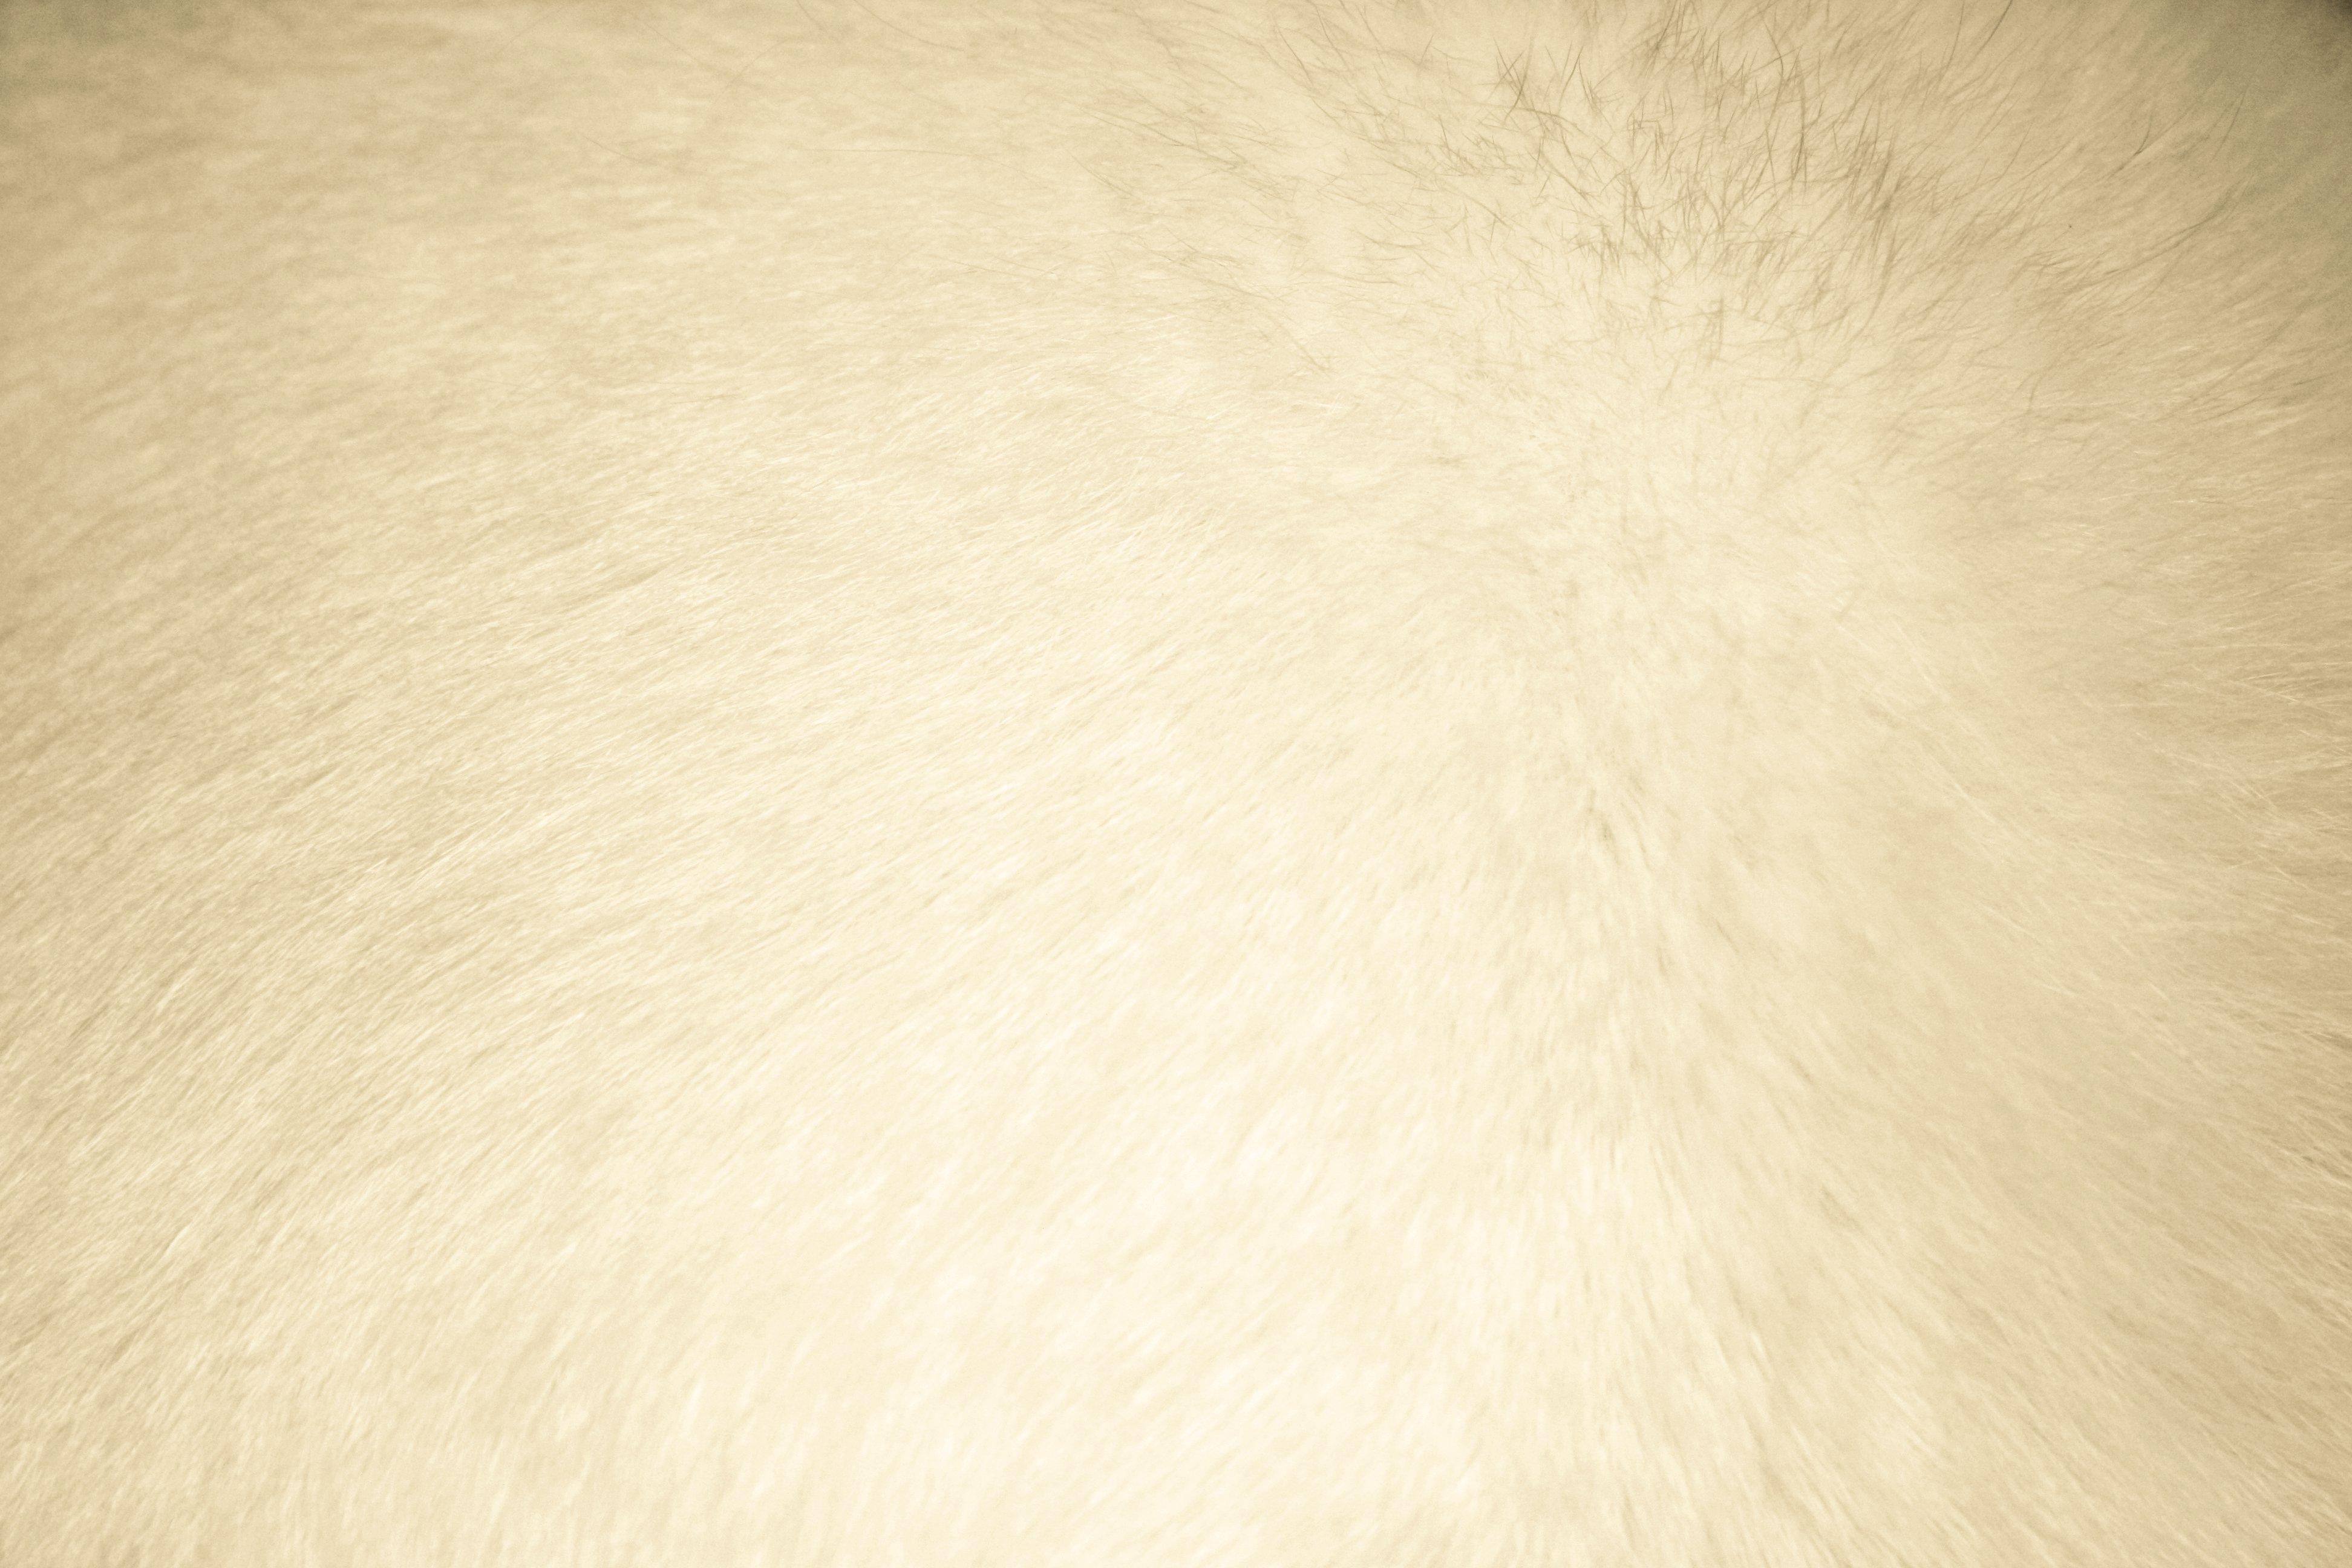 Download Beige Fur Texture High Resolution Dimensions Wallpaper 3888x2592